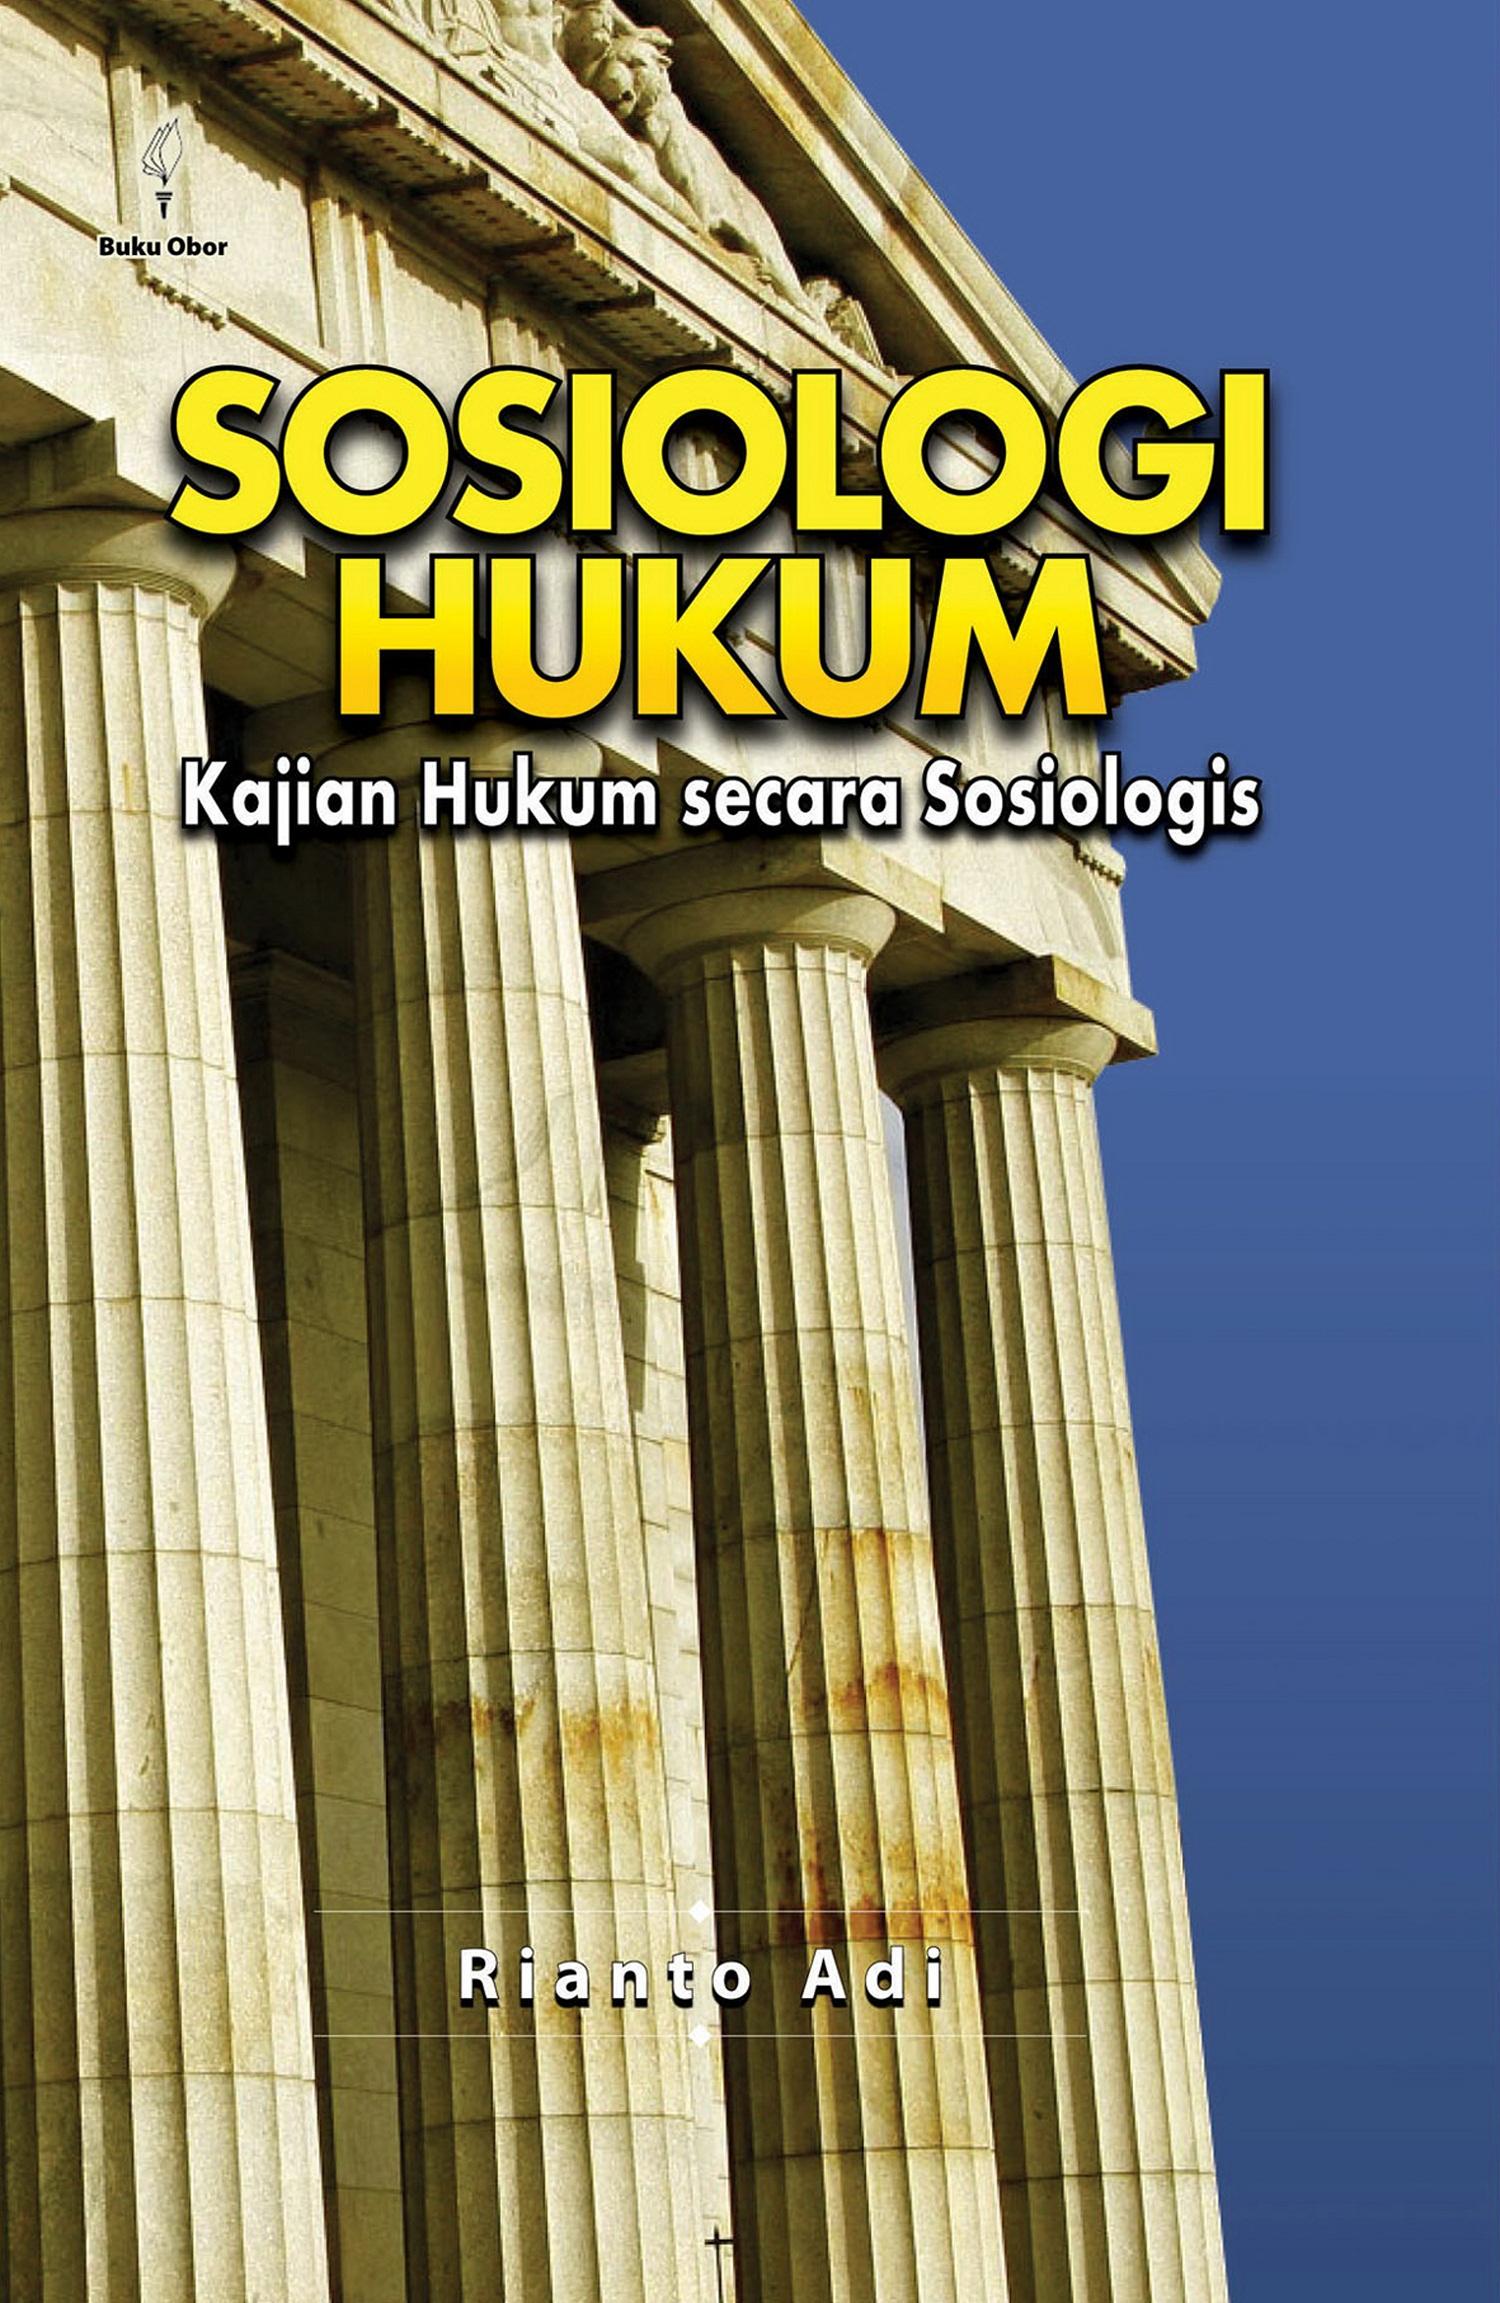 Sosiologi hukum [sumber elektronis] : kajian hukum secara sosiologis